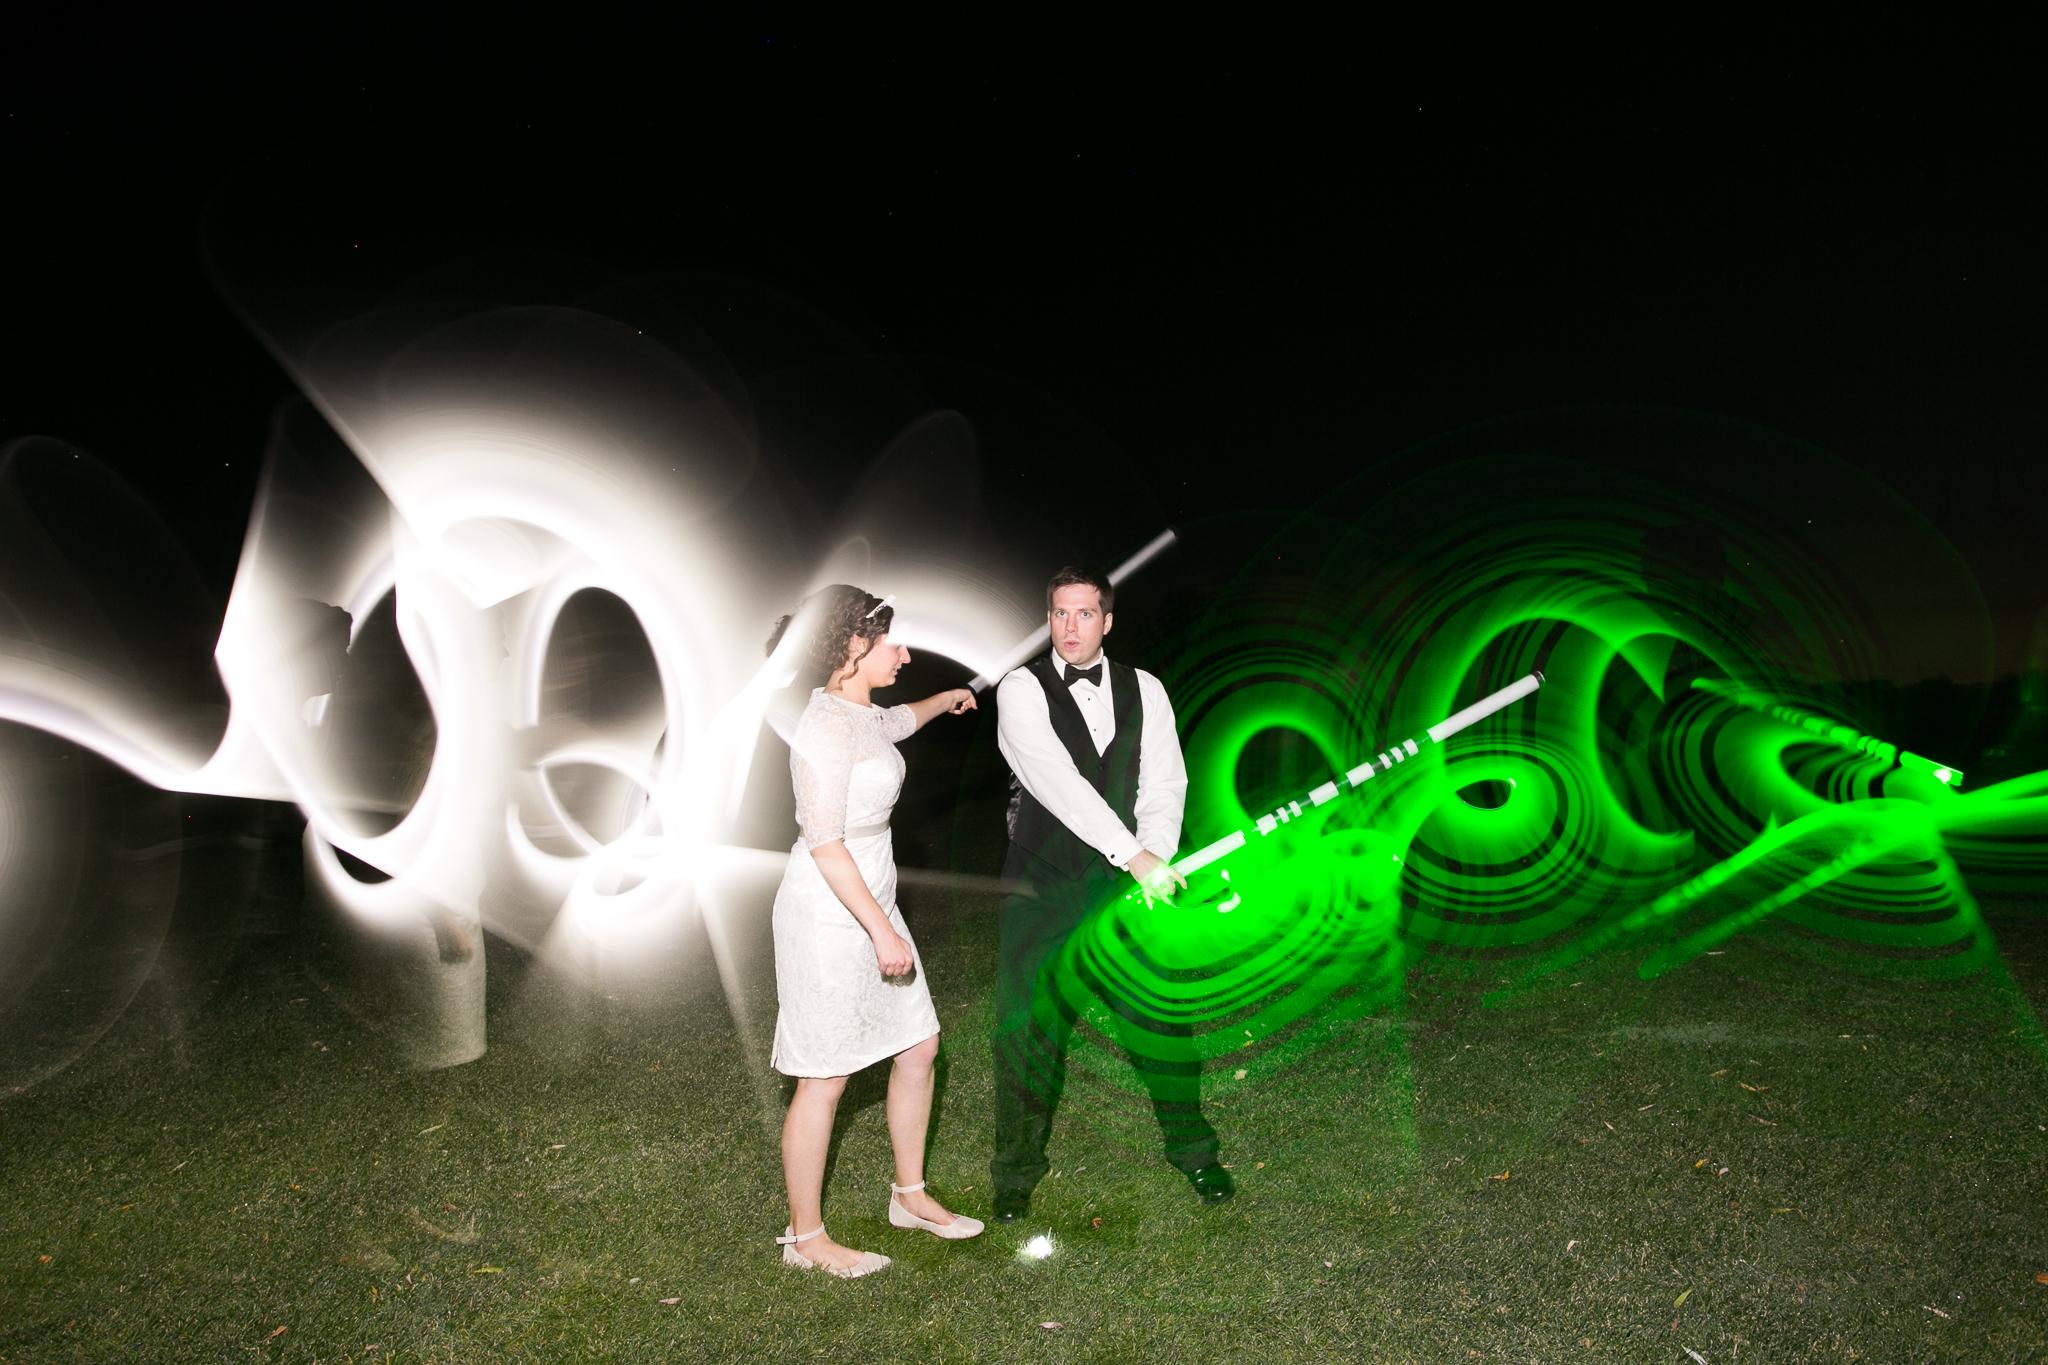 camuglia-whomstudio-chelsea_and_andy-nycphotographer-wedding-brooklyn-buffalo-timberlodge-185-5770.jpg